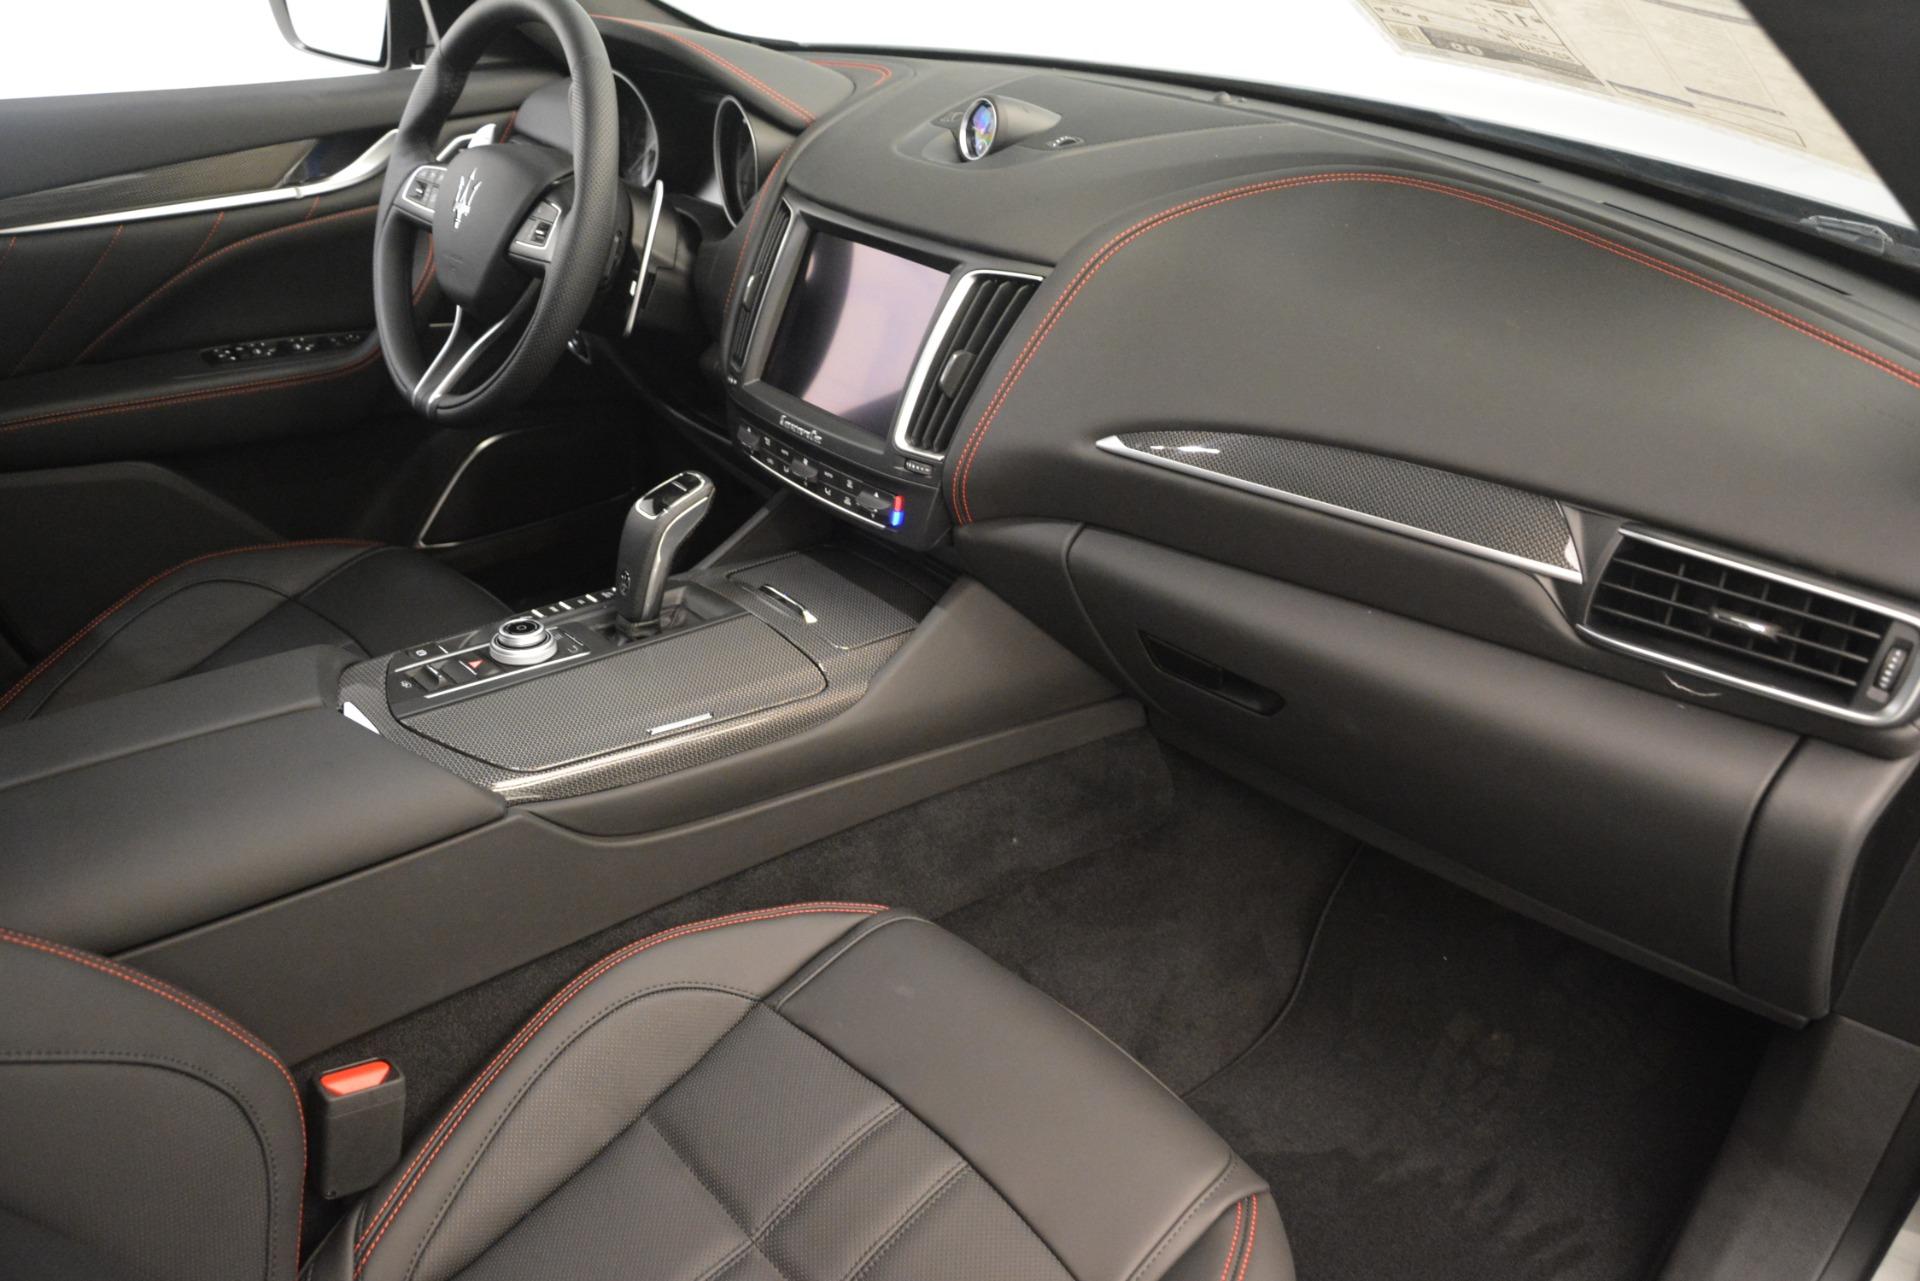 New 2019 Maserati Levante SQ4 GranSport Nerissimo For Sale In Westport, CT 3144_p22